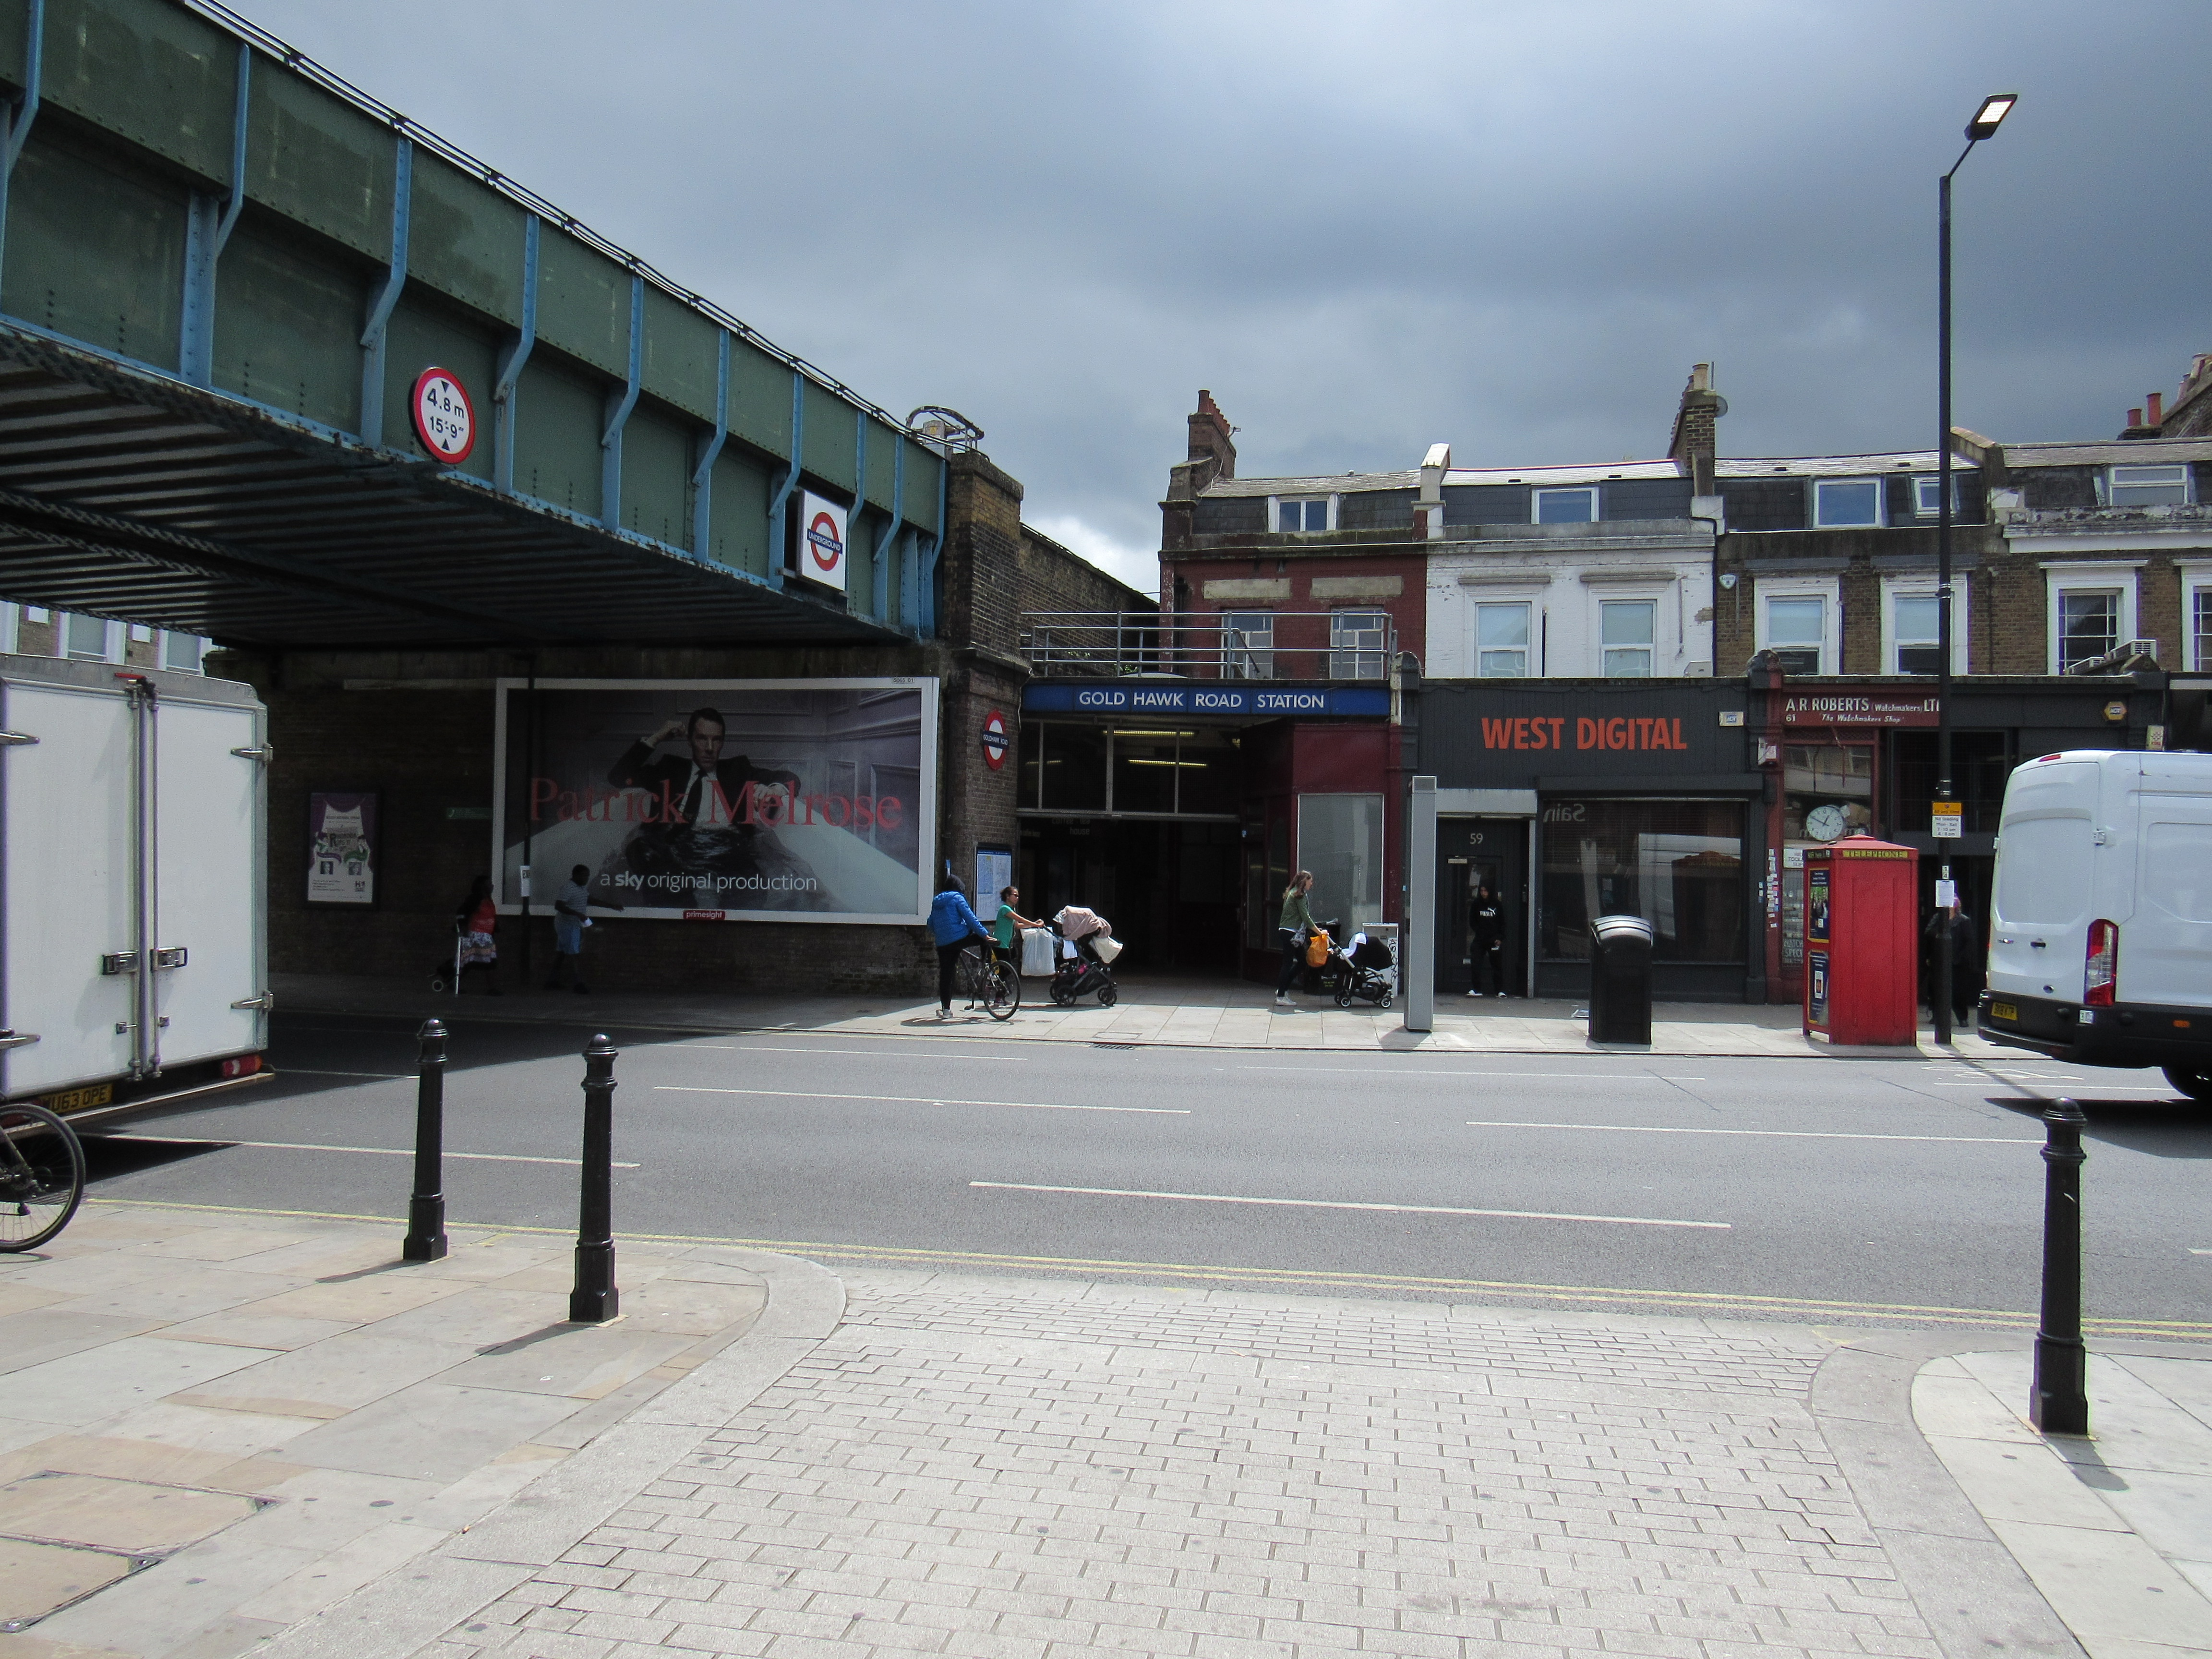 Gold Hawk Road Tube Station